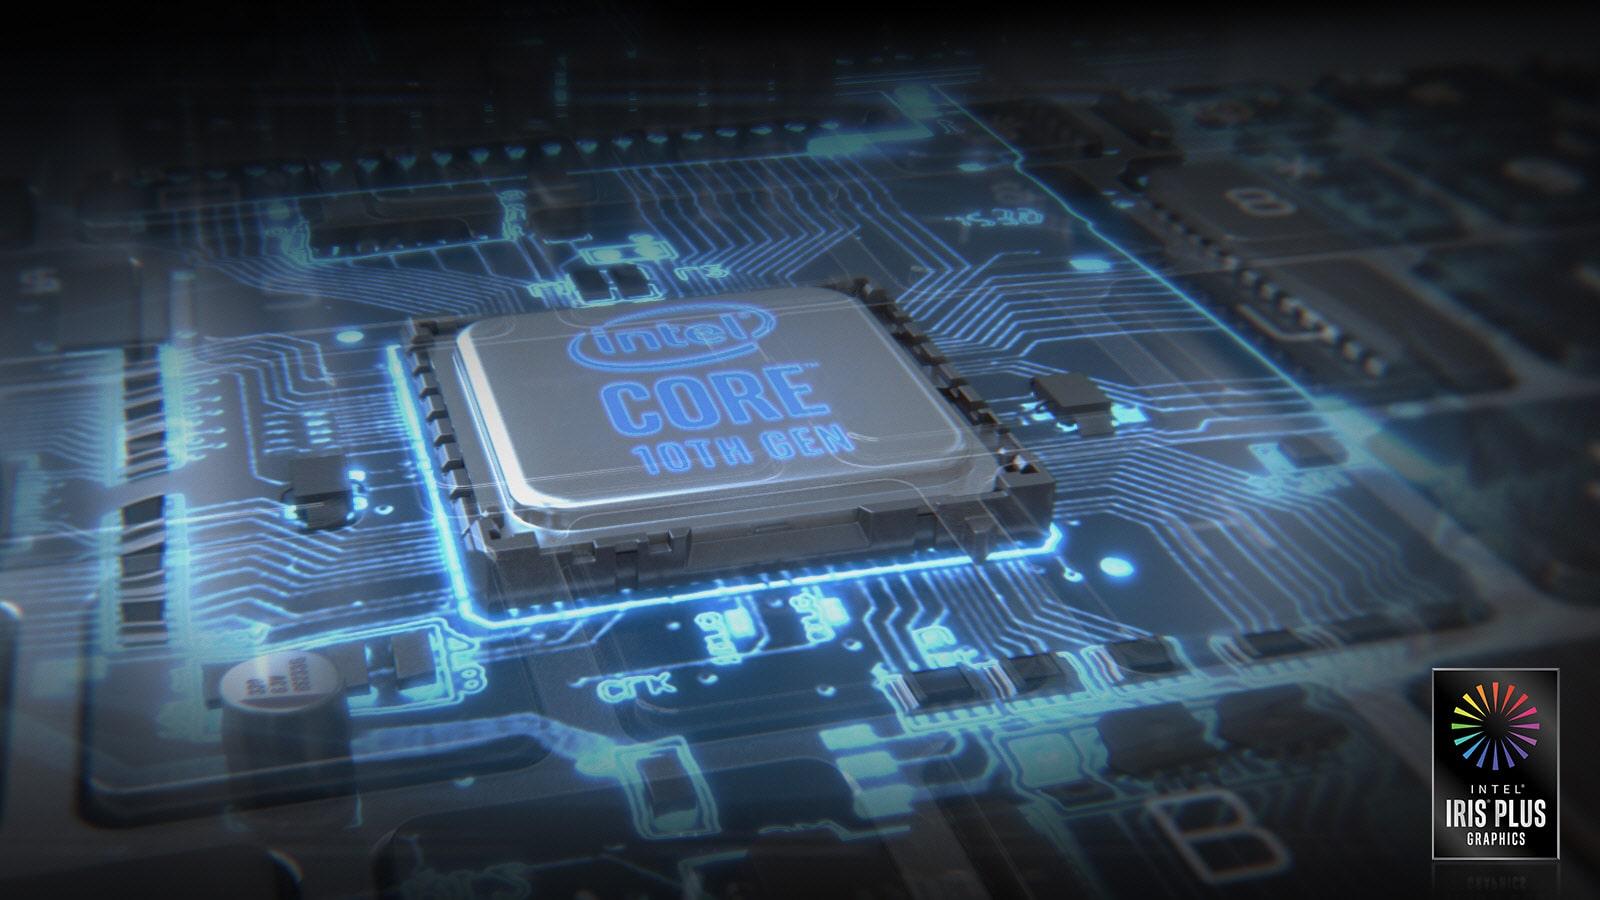 Image of Intel processor with Intel Core logo